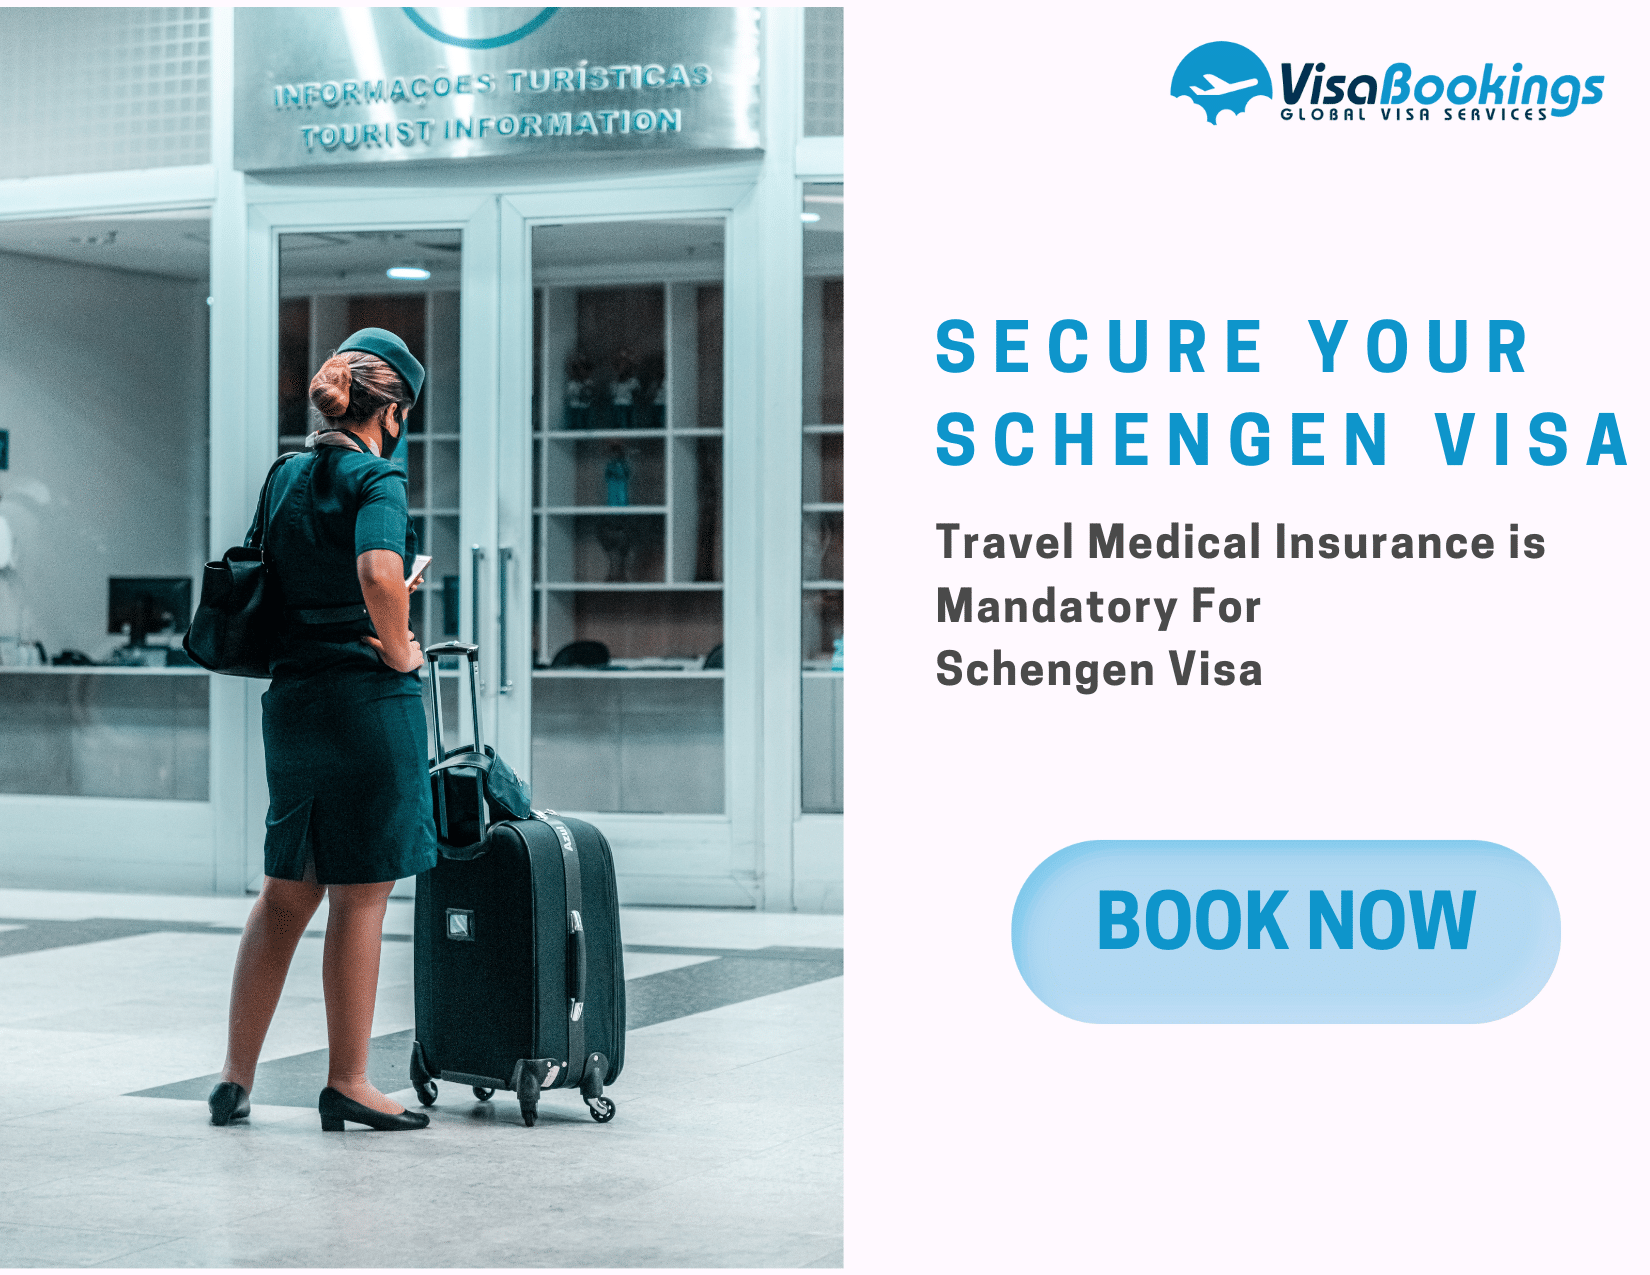 schengen-visa-travel-medical-insurance